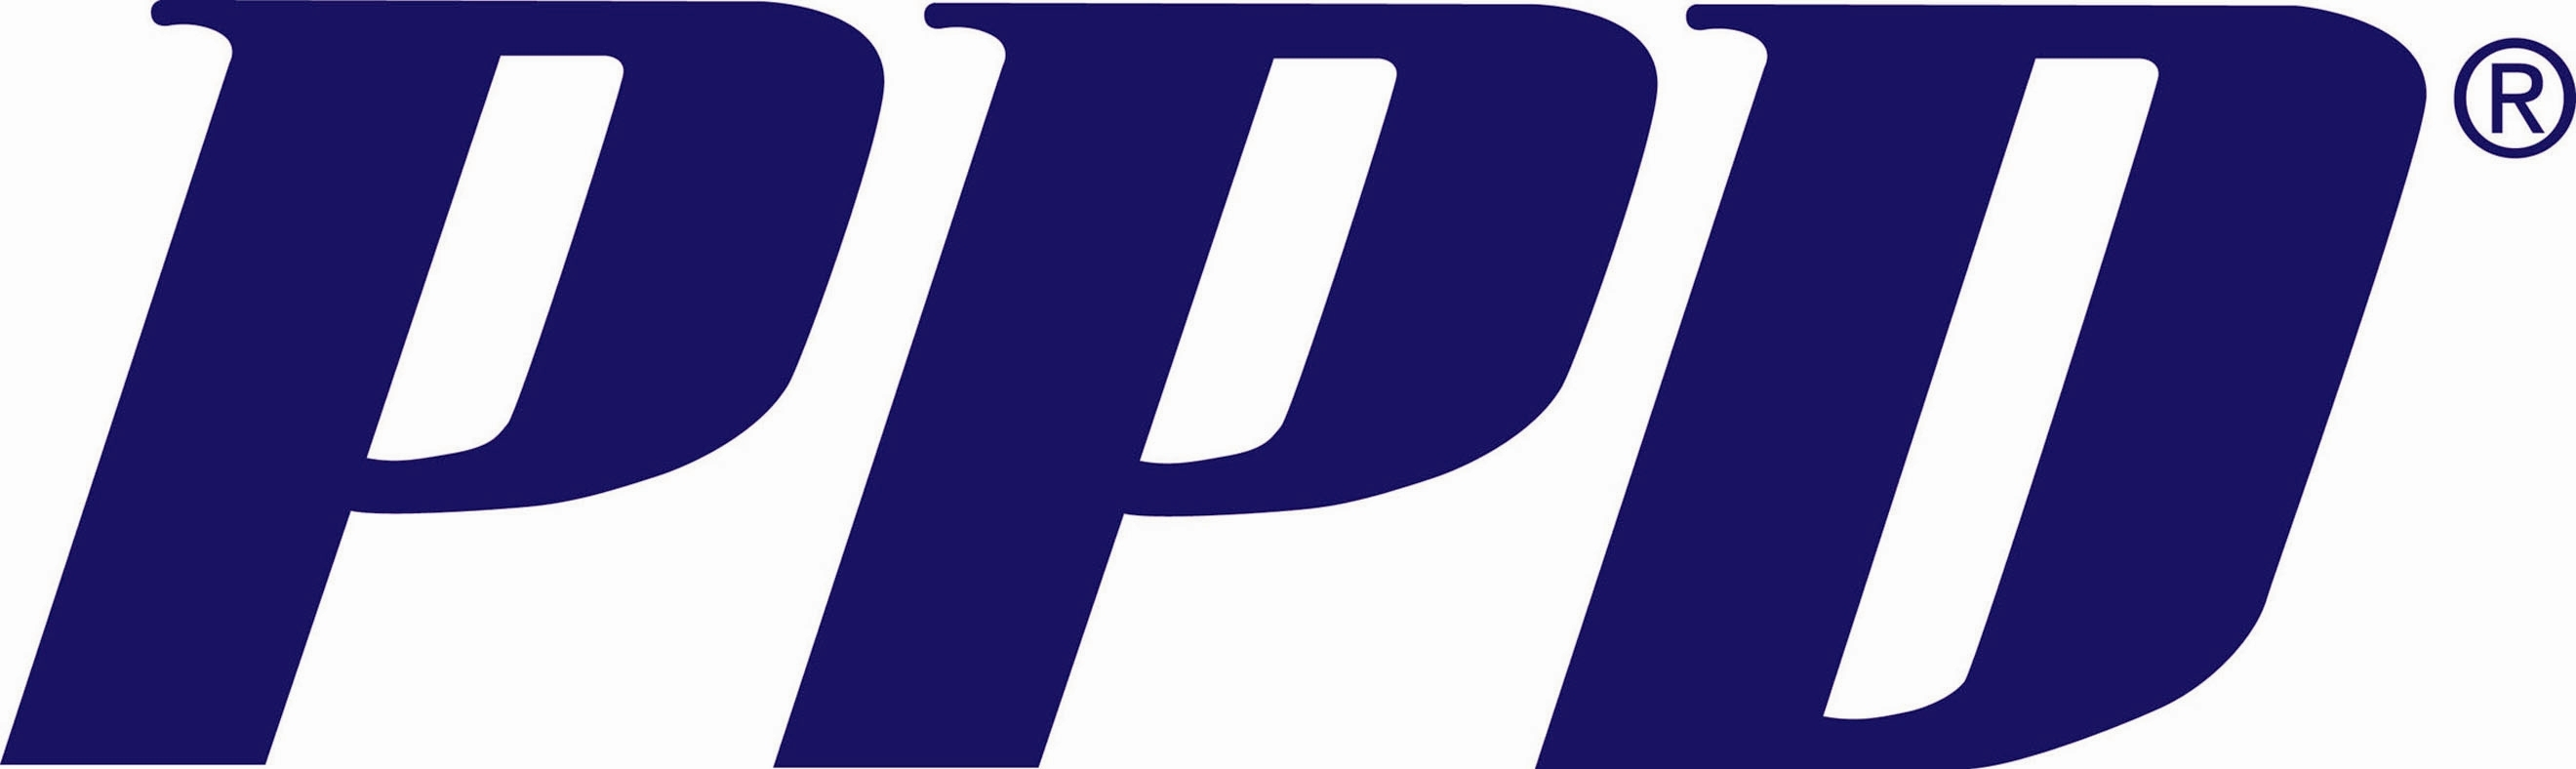 product development logo for - photo #35